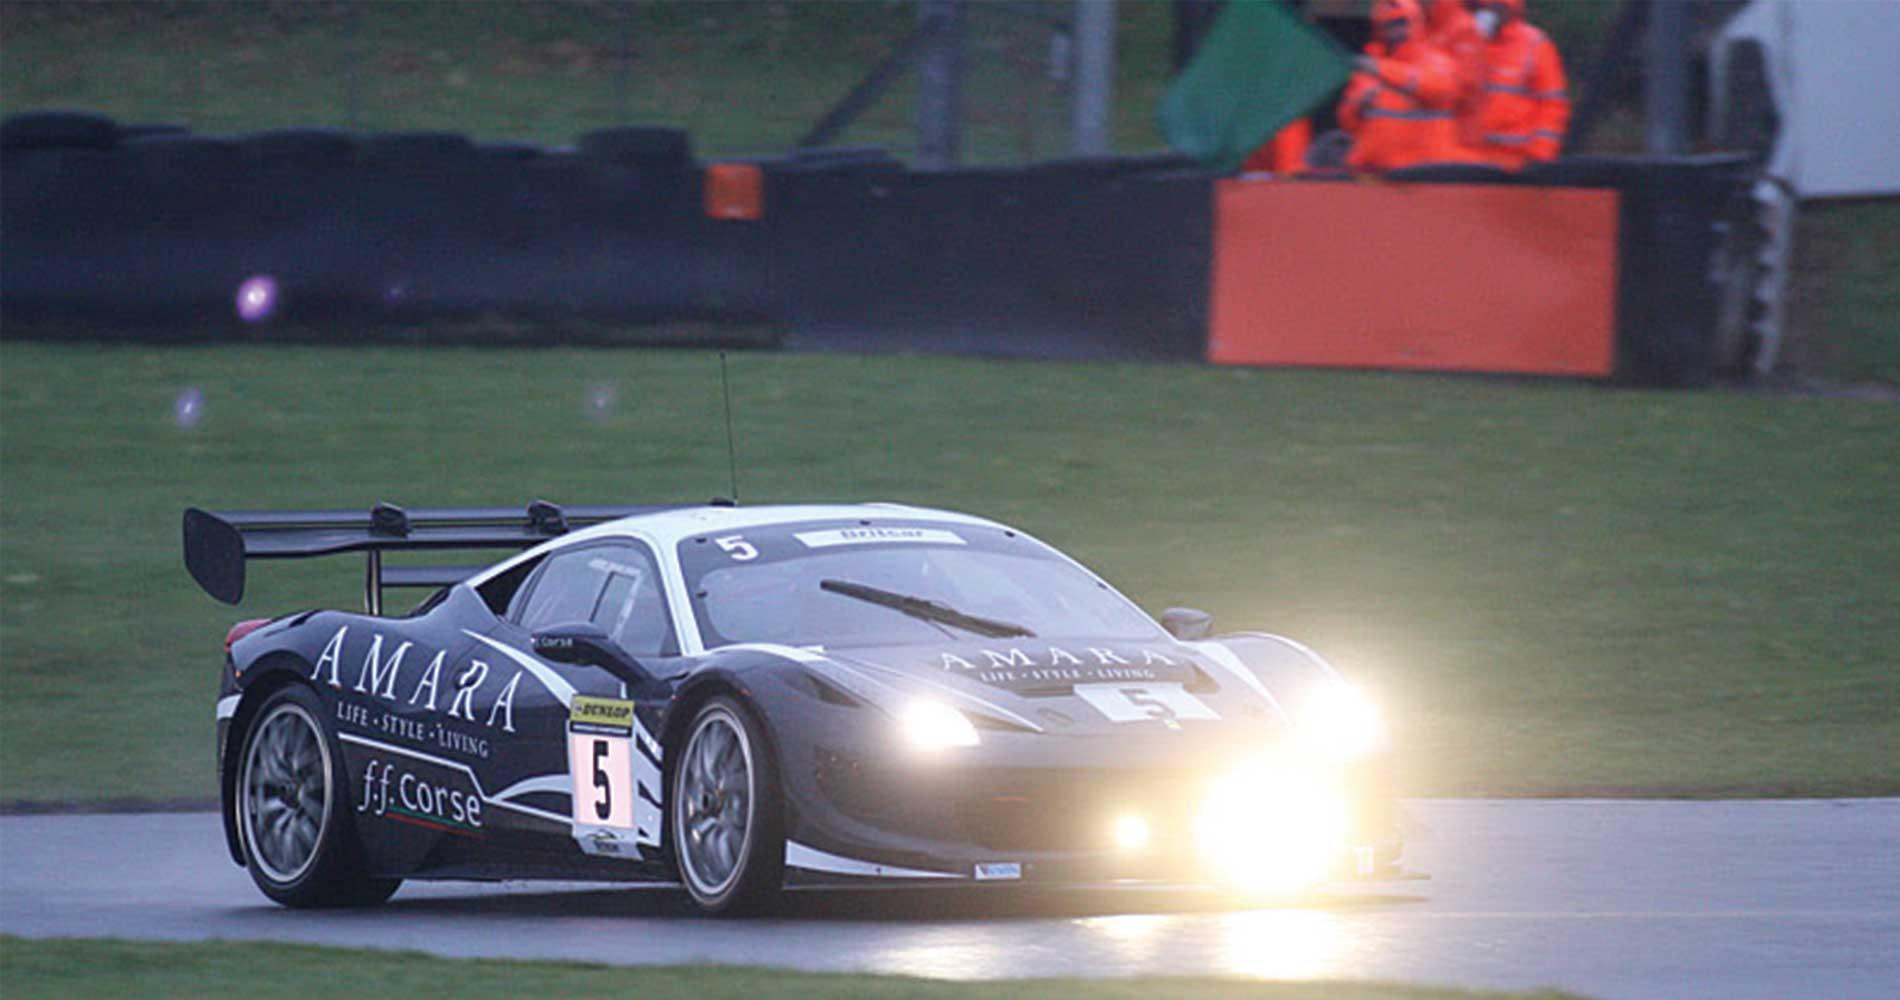 race-report-dunlop-gt-production-championship-brands-hatch-1213th-november-2016-motorsportdays-test-days-2